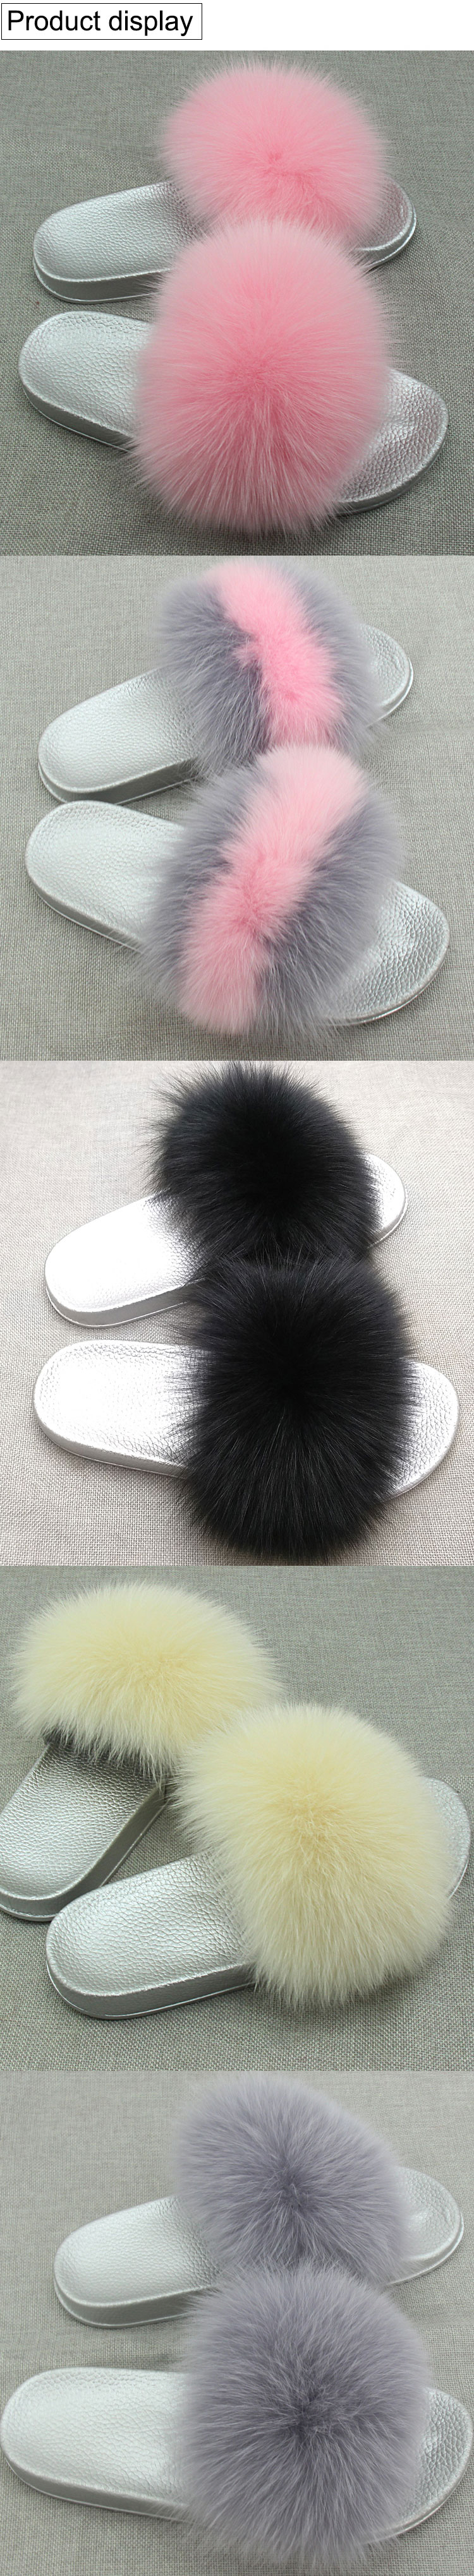 real luxo menina praia sandália sapatos macio confortável peludo flip flops